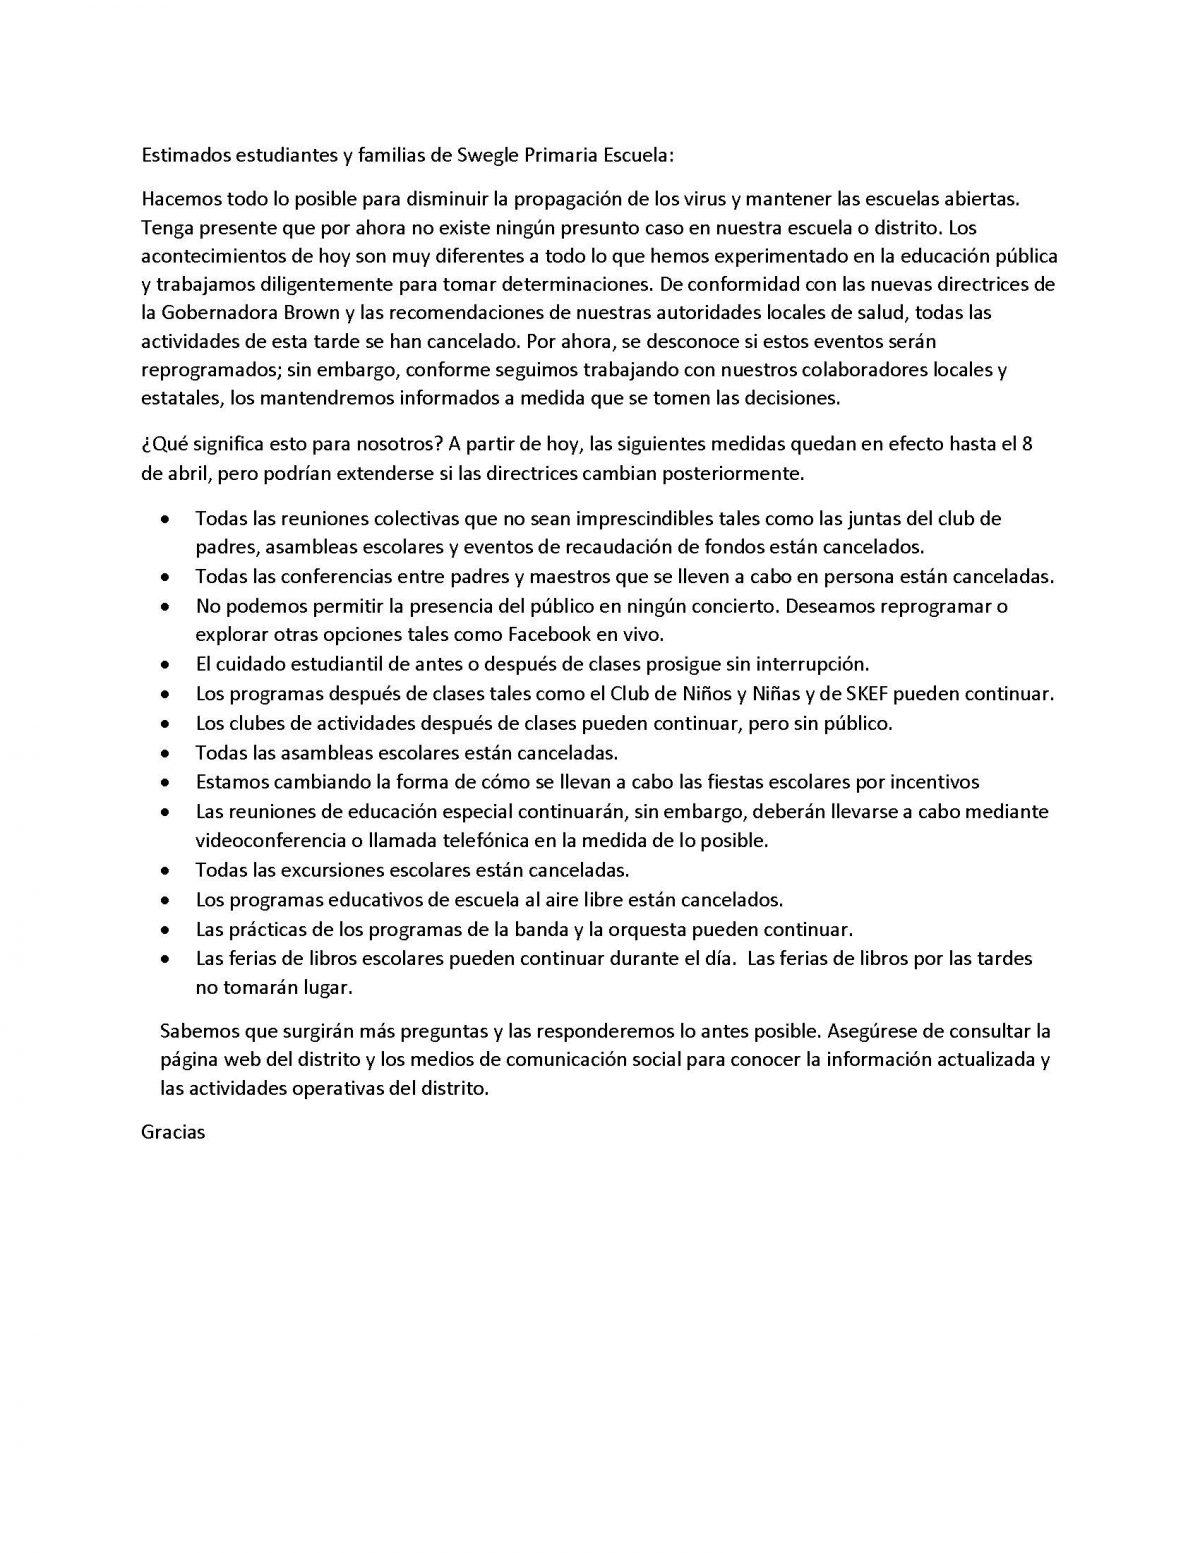 Spanish COVID-19 Info